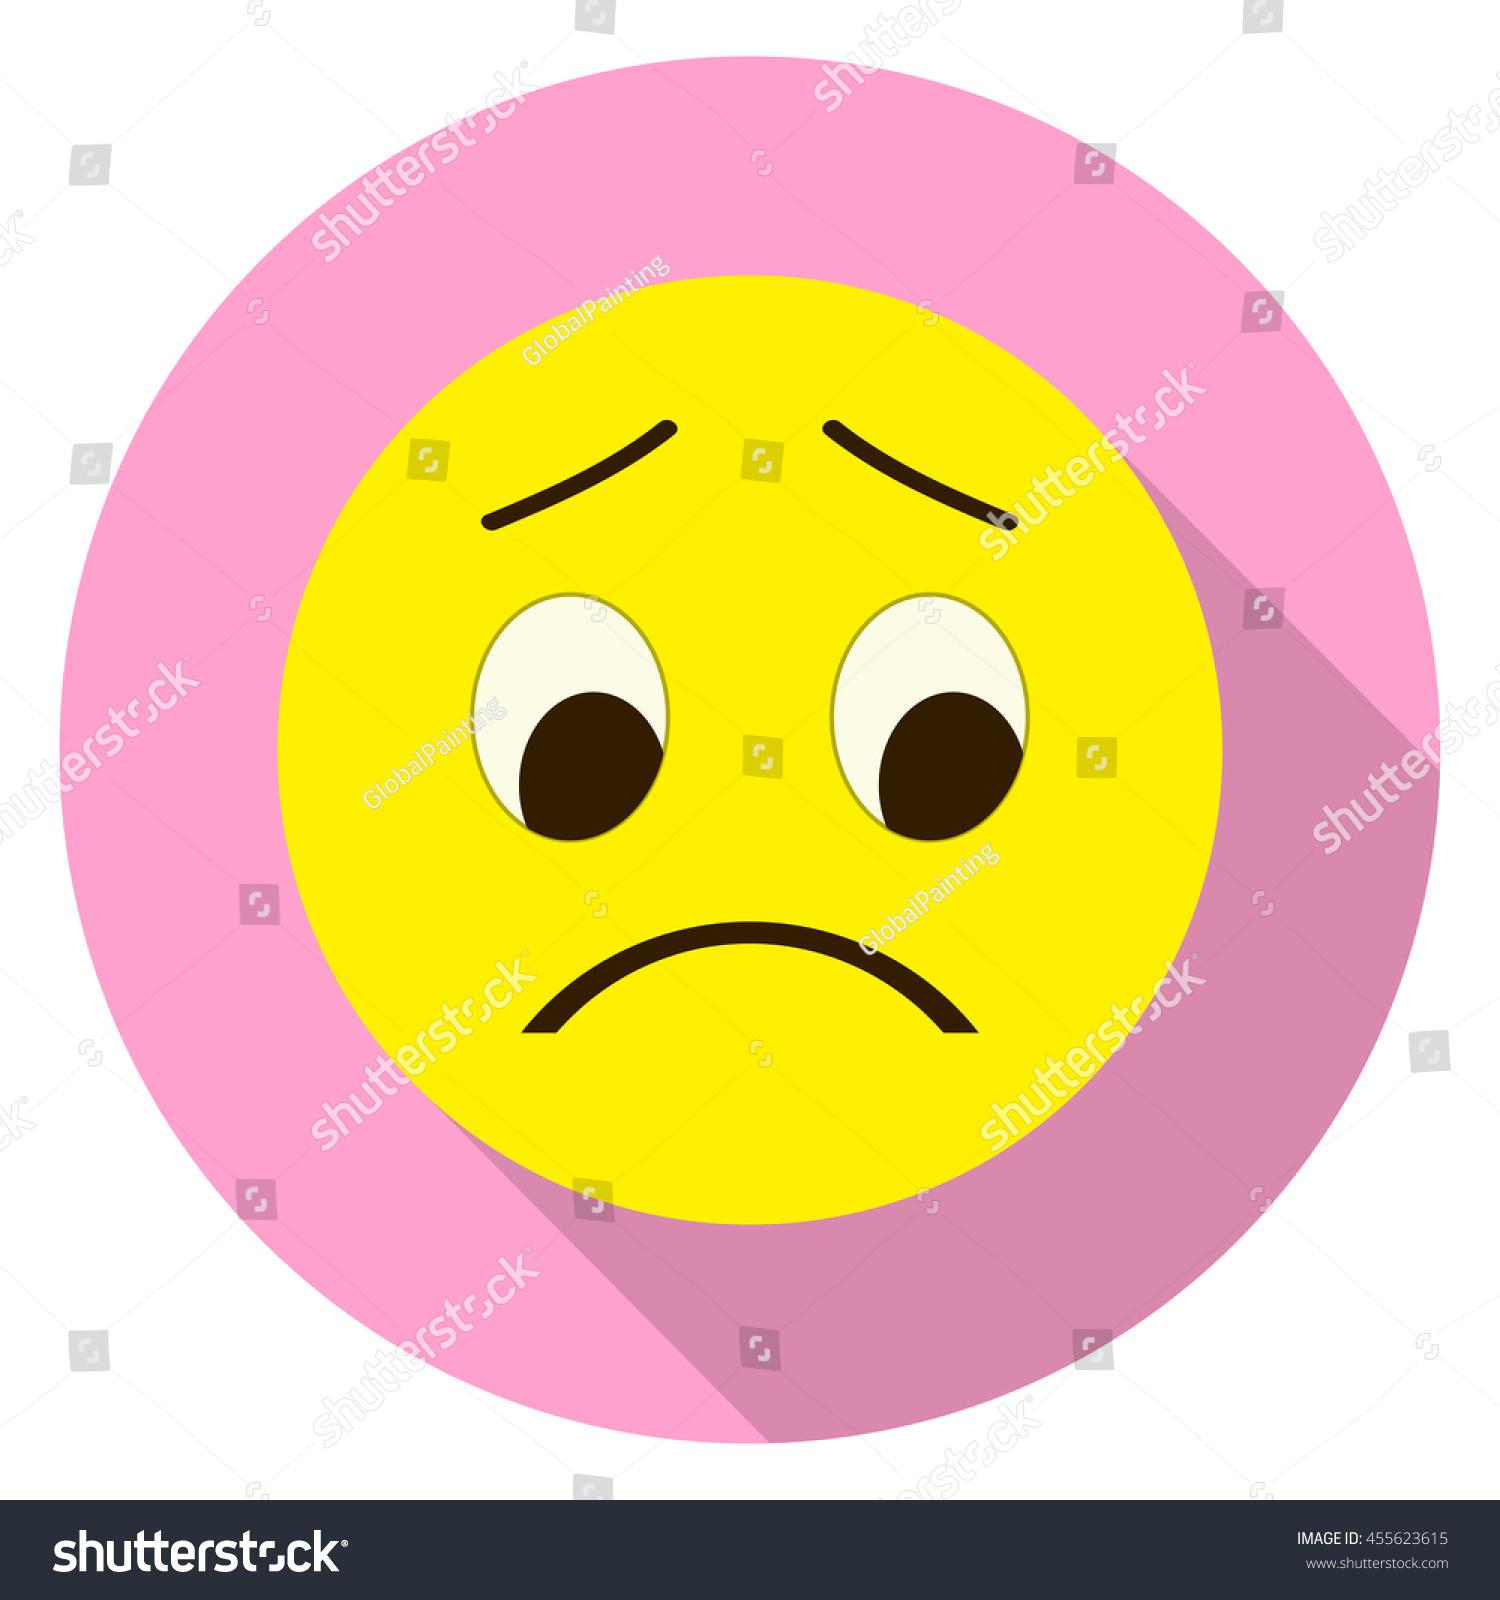 Emoticon Sad Face Sad Emoji Isolated Stock Vector 455623615 ...